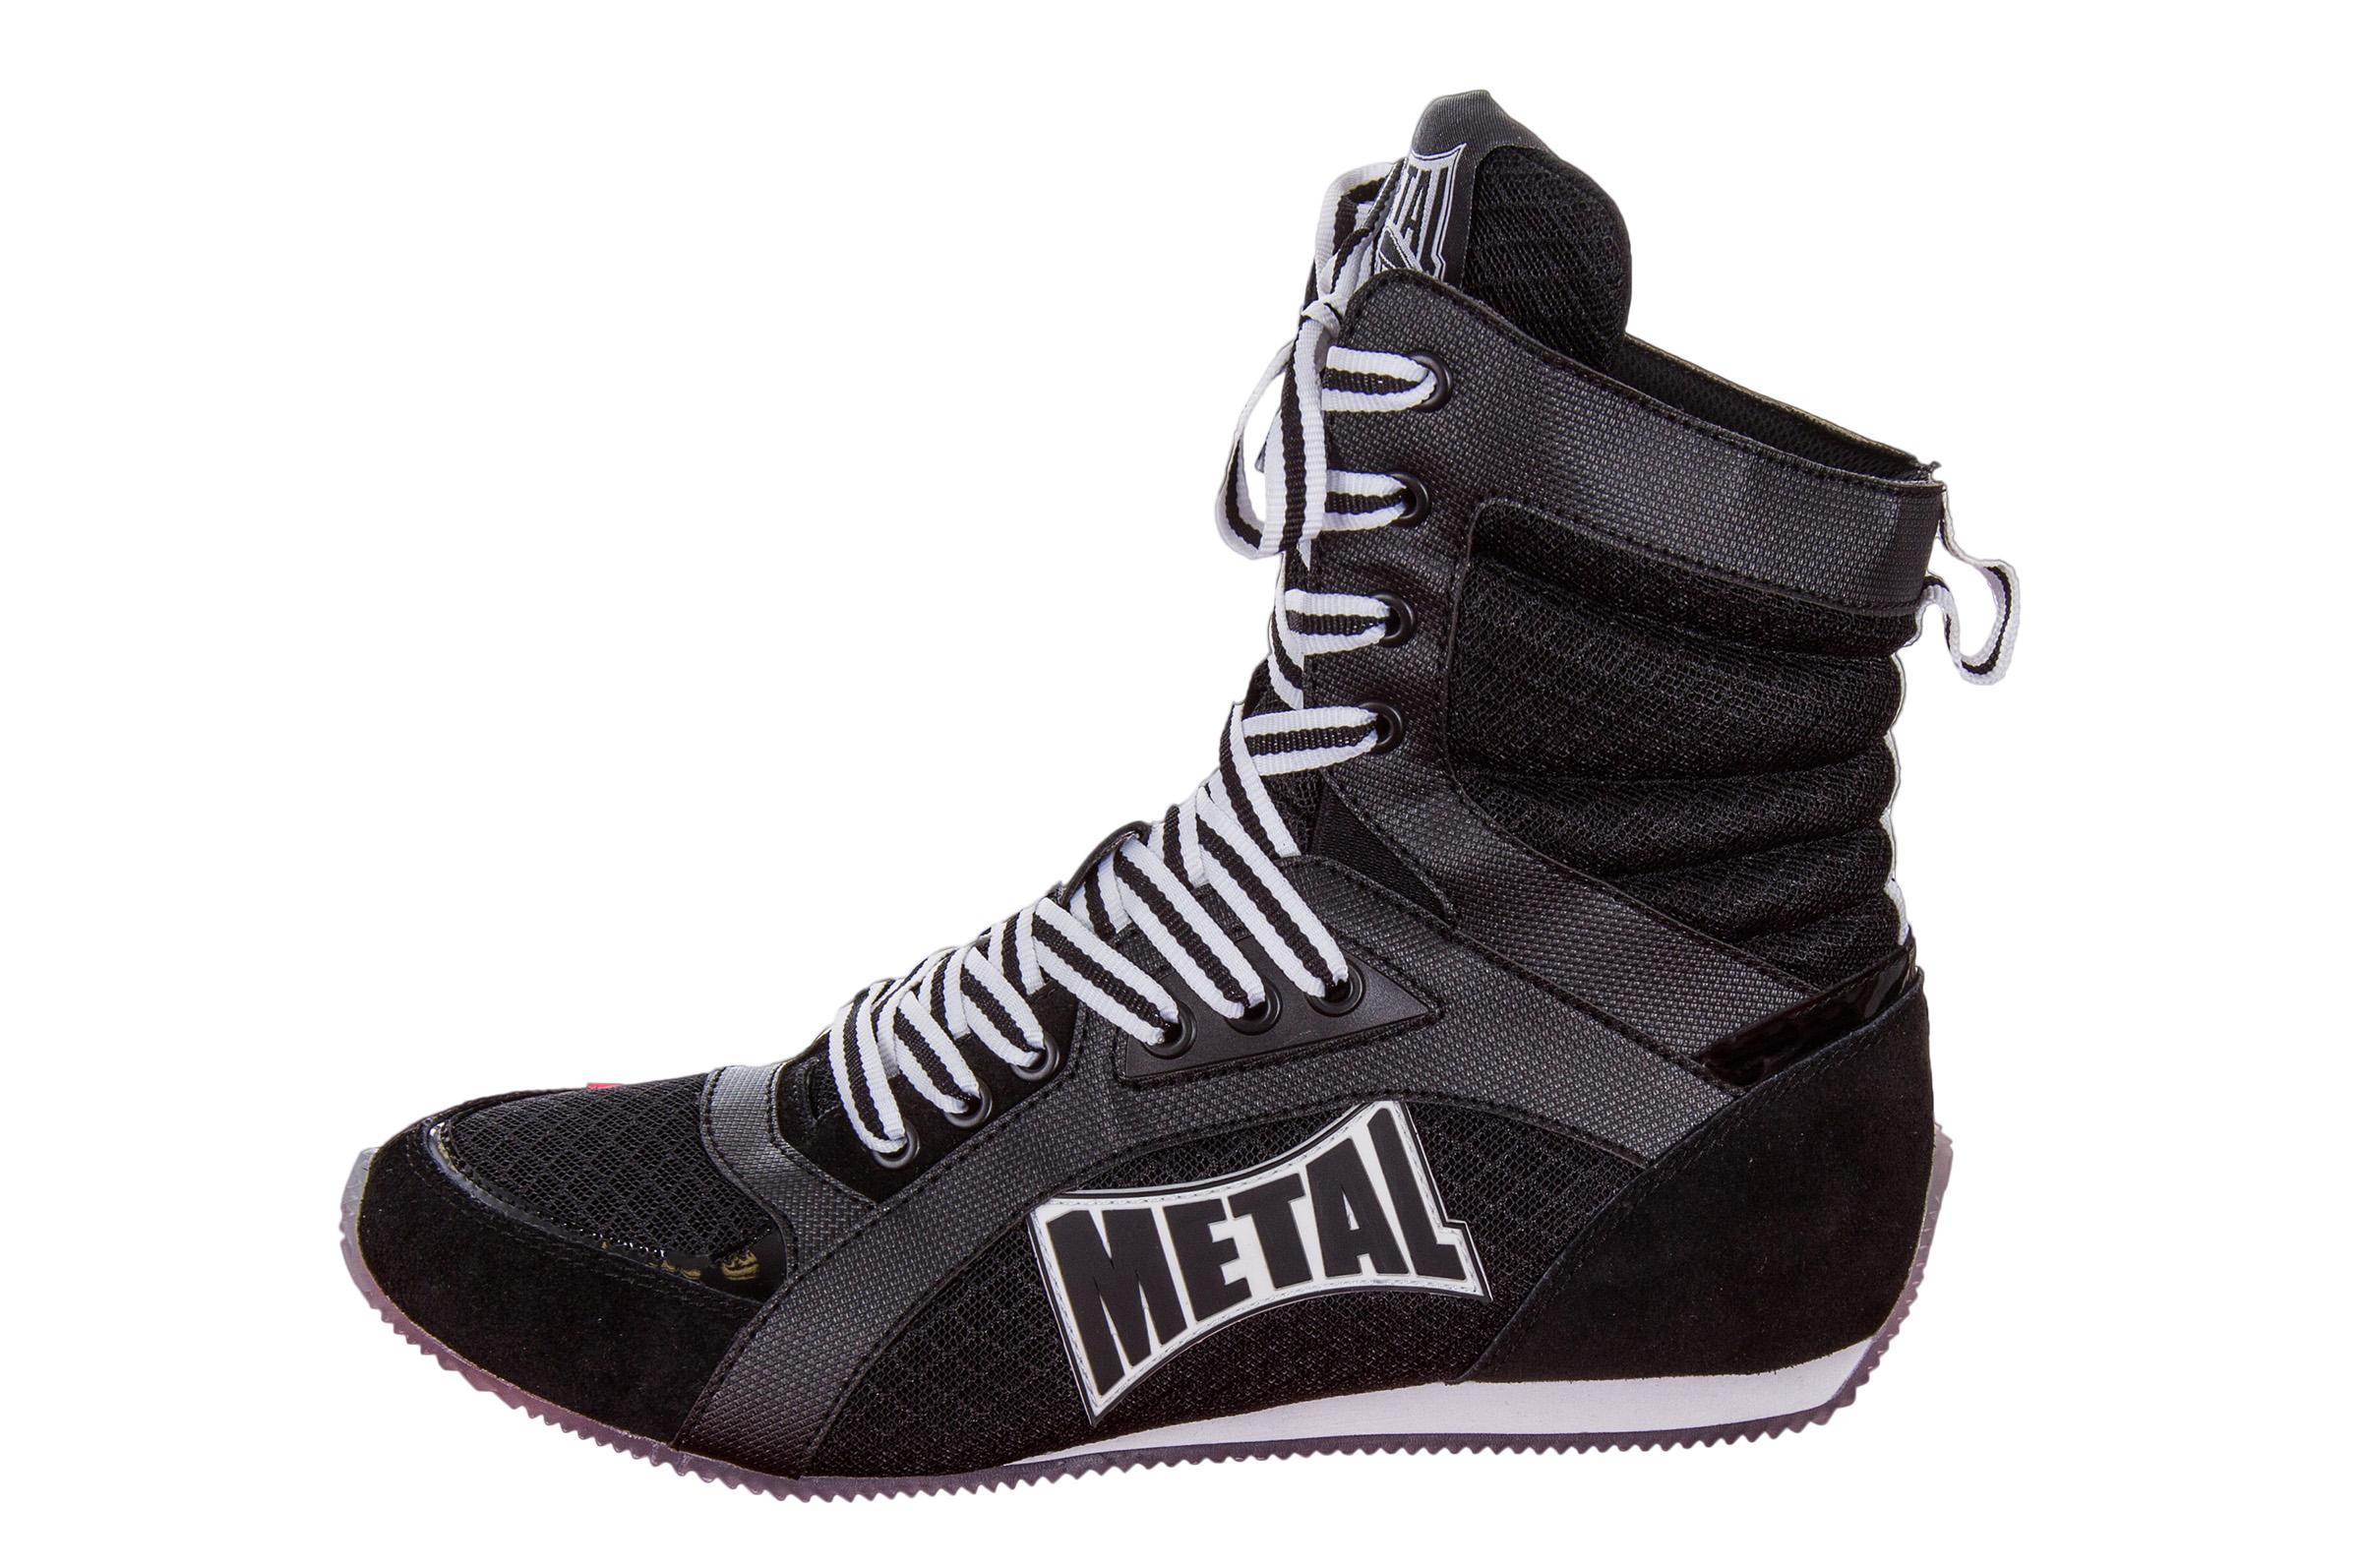 Metal Boxe Haute De Viper chaussures Chaussure Anglaise